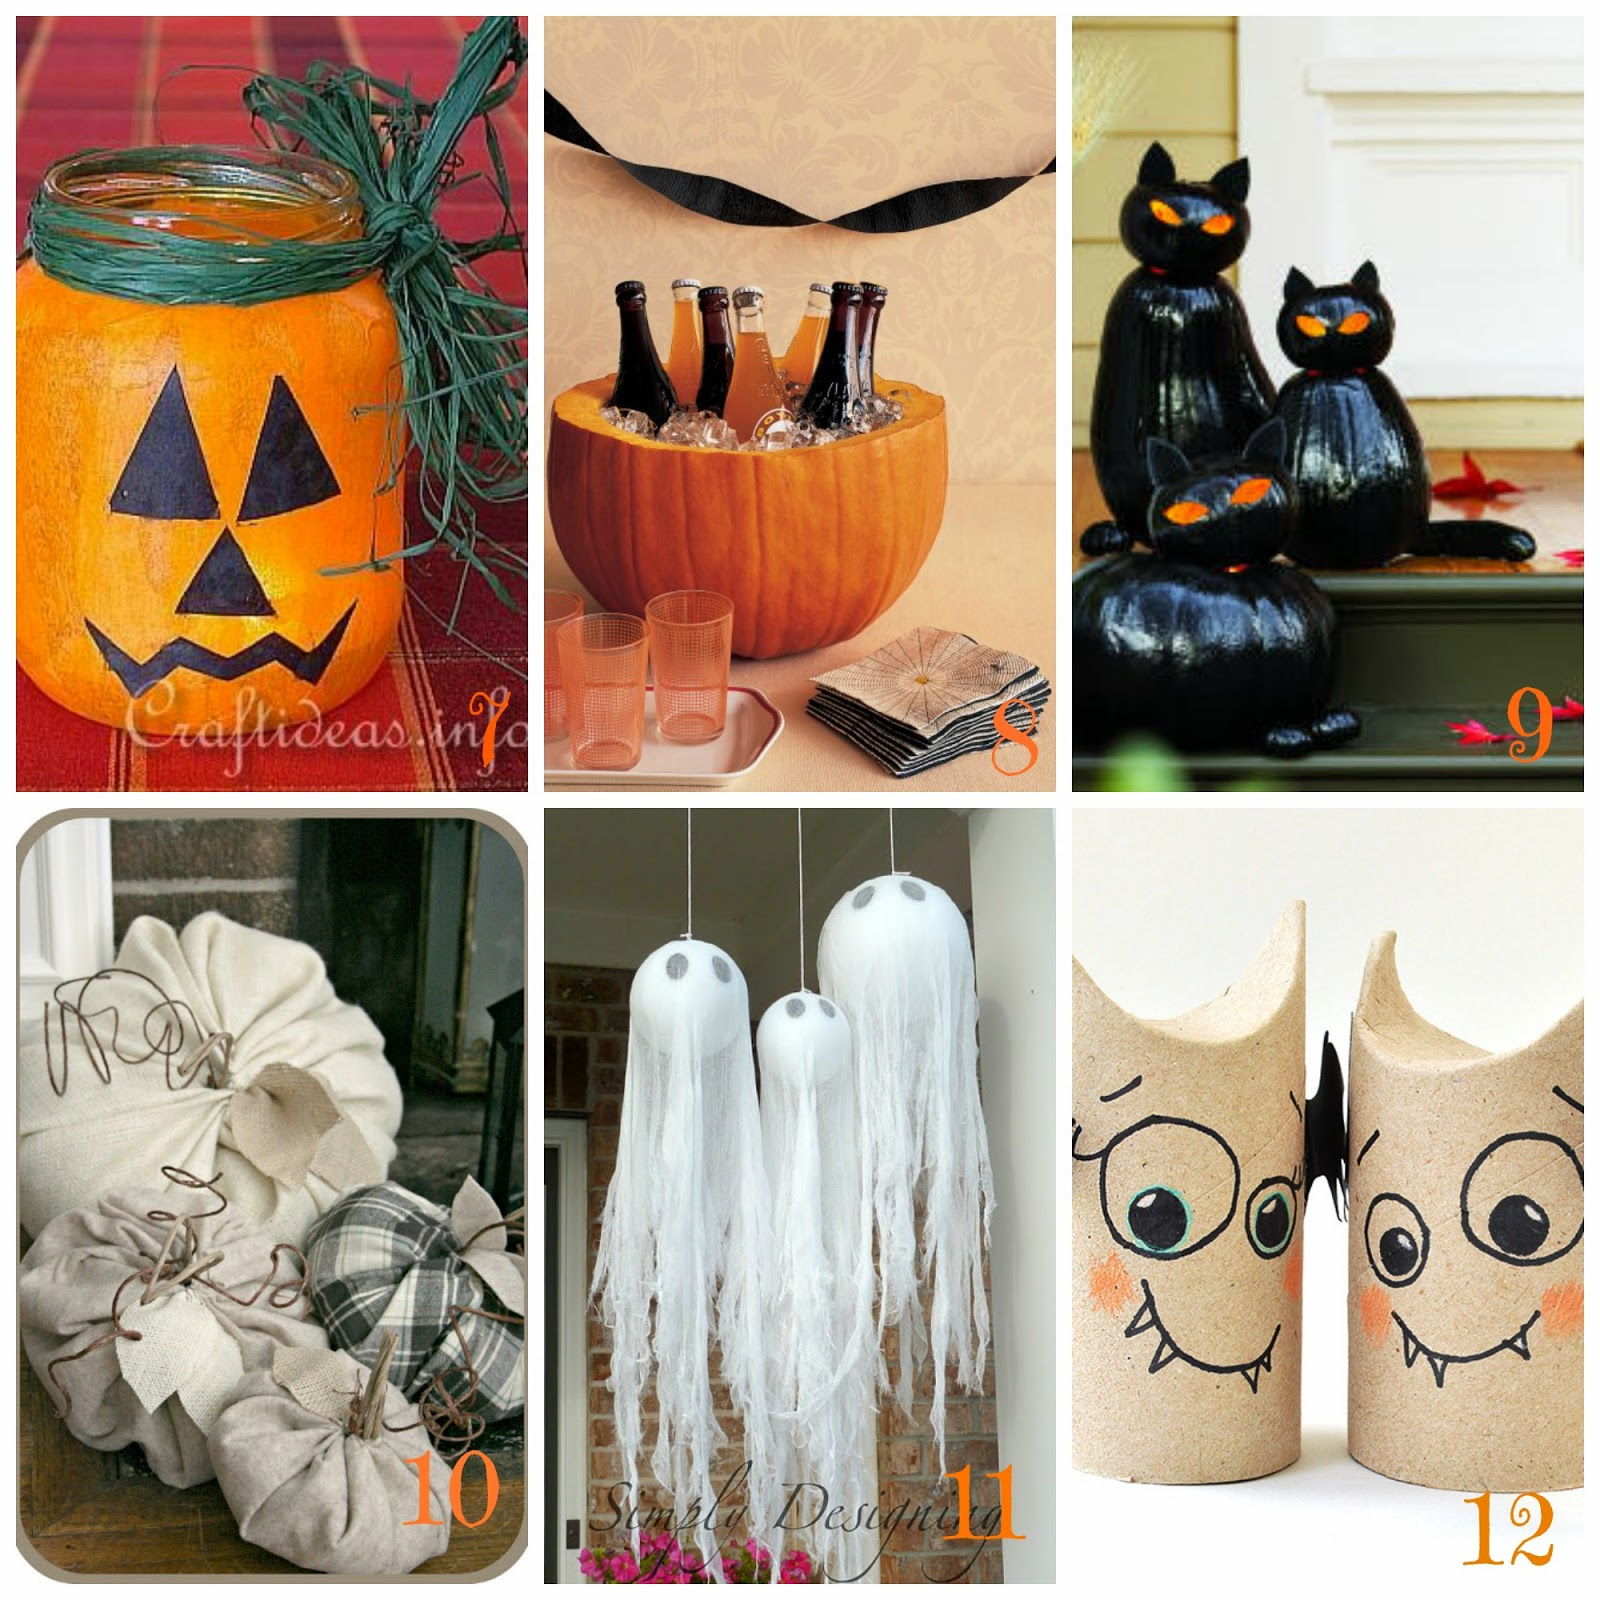 Halloween decorazioni fai da te 12 tutorial facili e veloci dal web - Decorazioni casa halloween ...